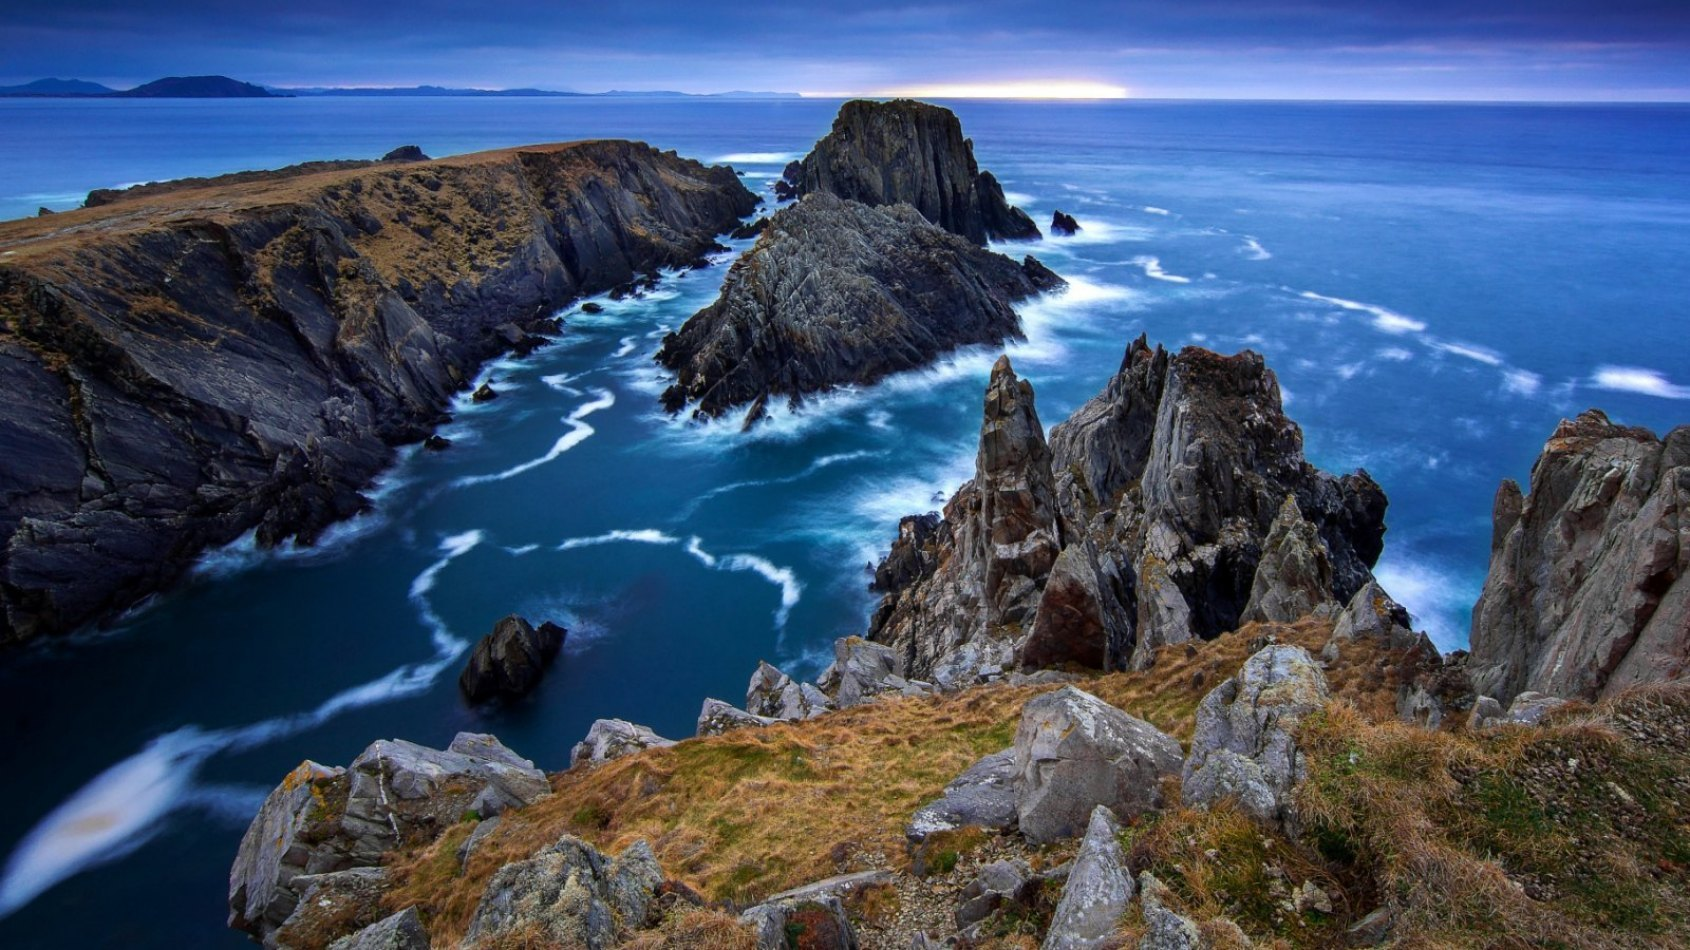 Nouvelle vidéo du tournage de Star Wars VIII en Irlande